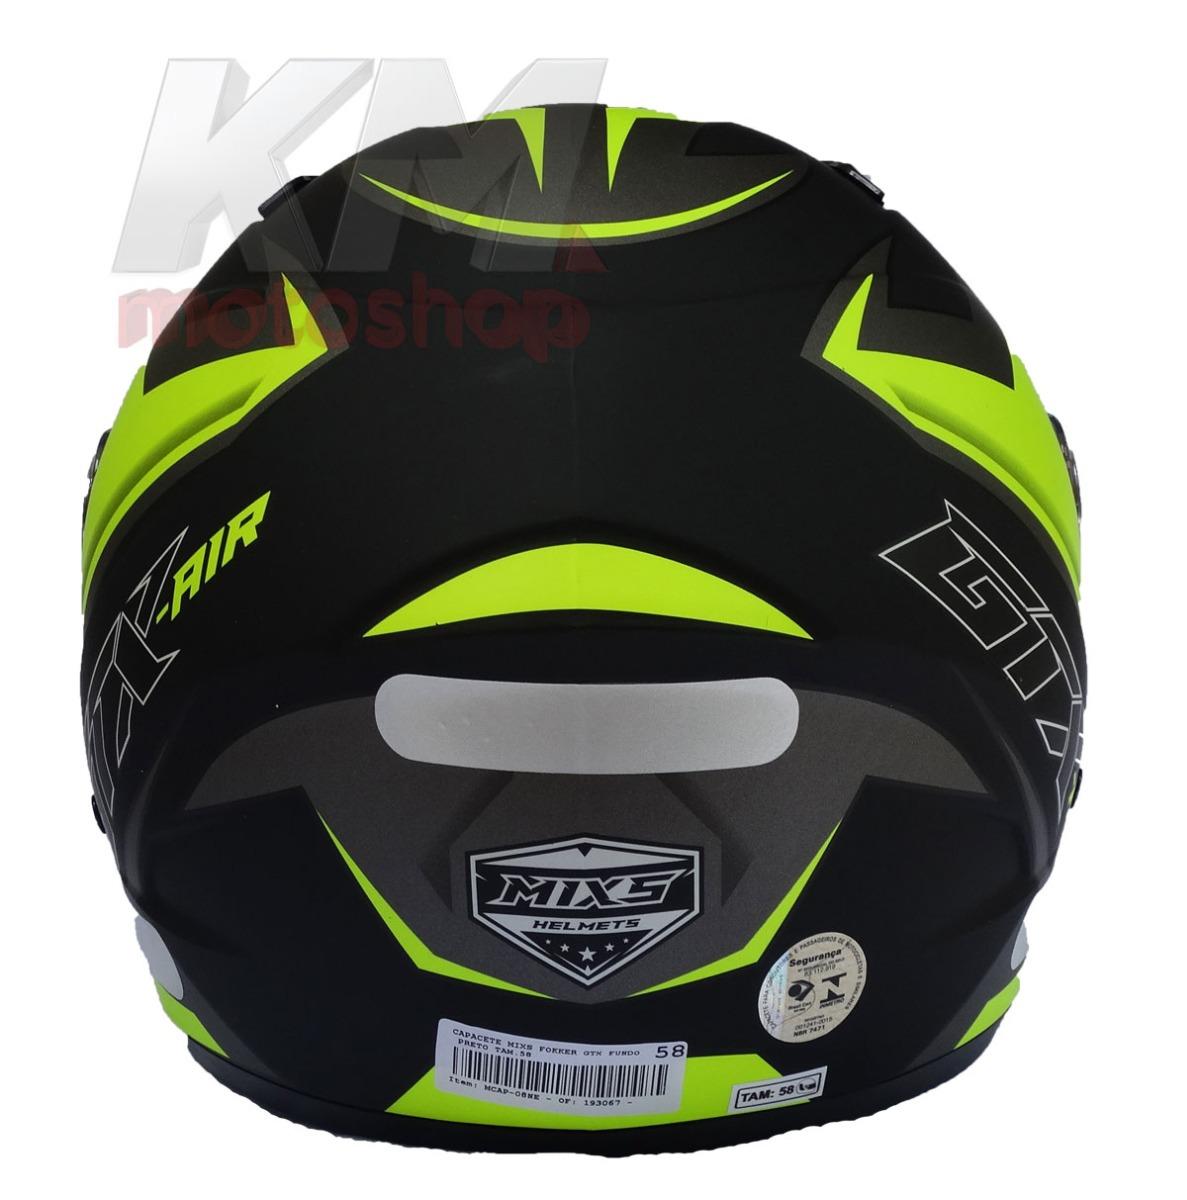 capacete moto mixs fokker gtx transfer amarelo neon fosco. Carregando  zoom... capacete moto mixs. Carregando zoom. 024cbd43fe8